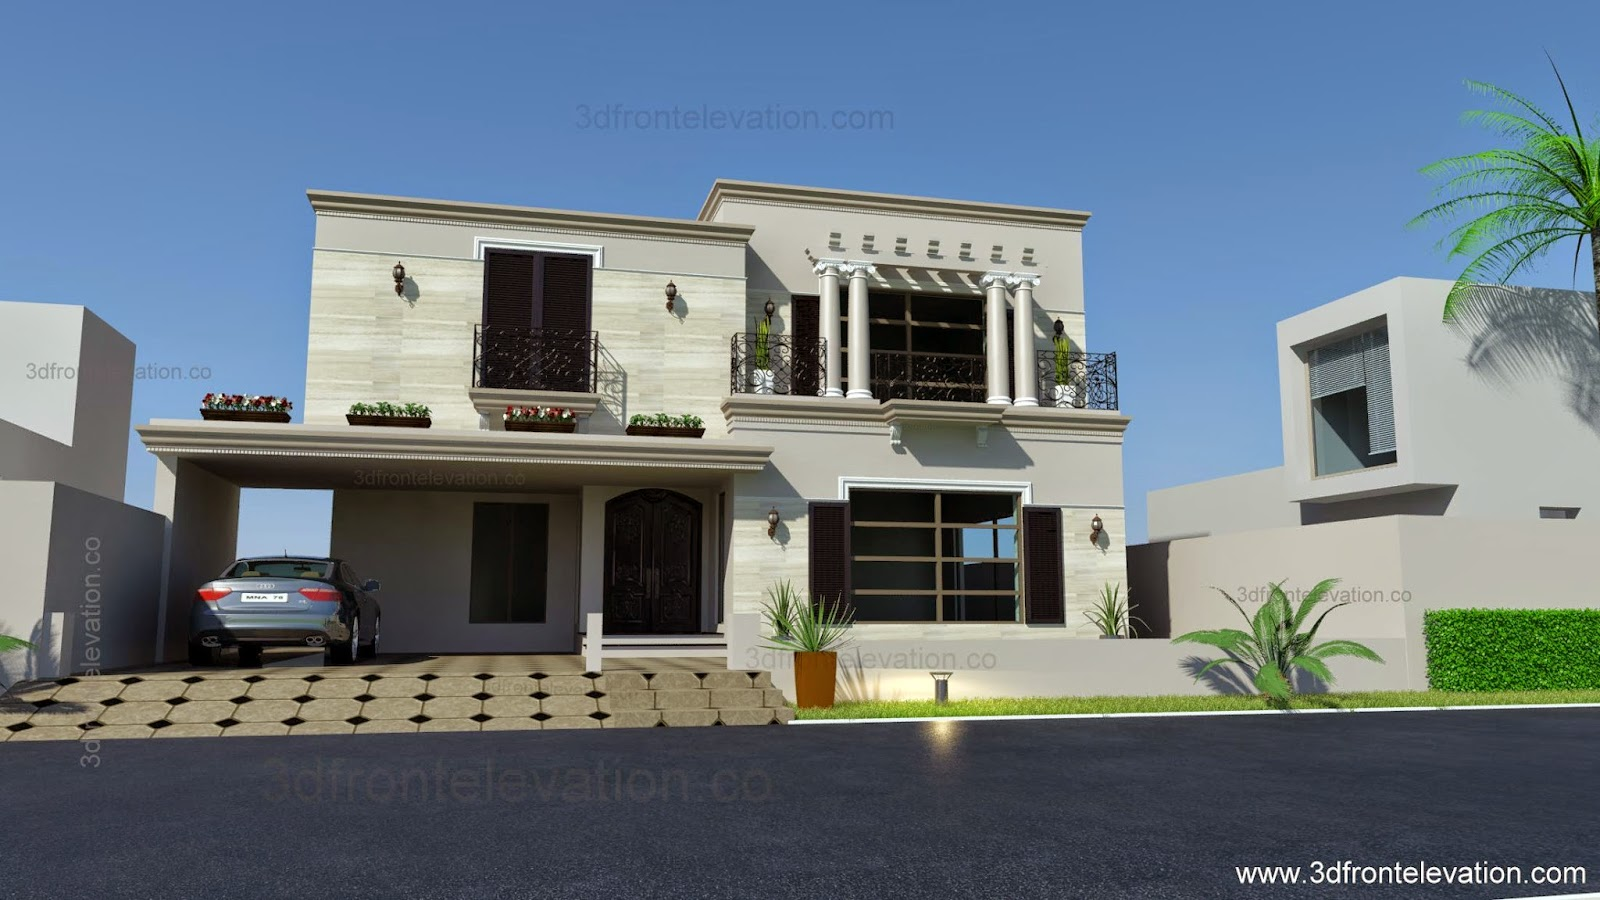 Front Elevation Design For Houses : D front elevation kanal spanish house design plan